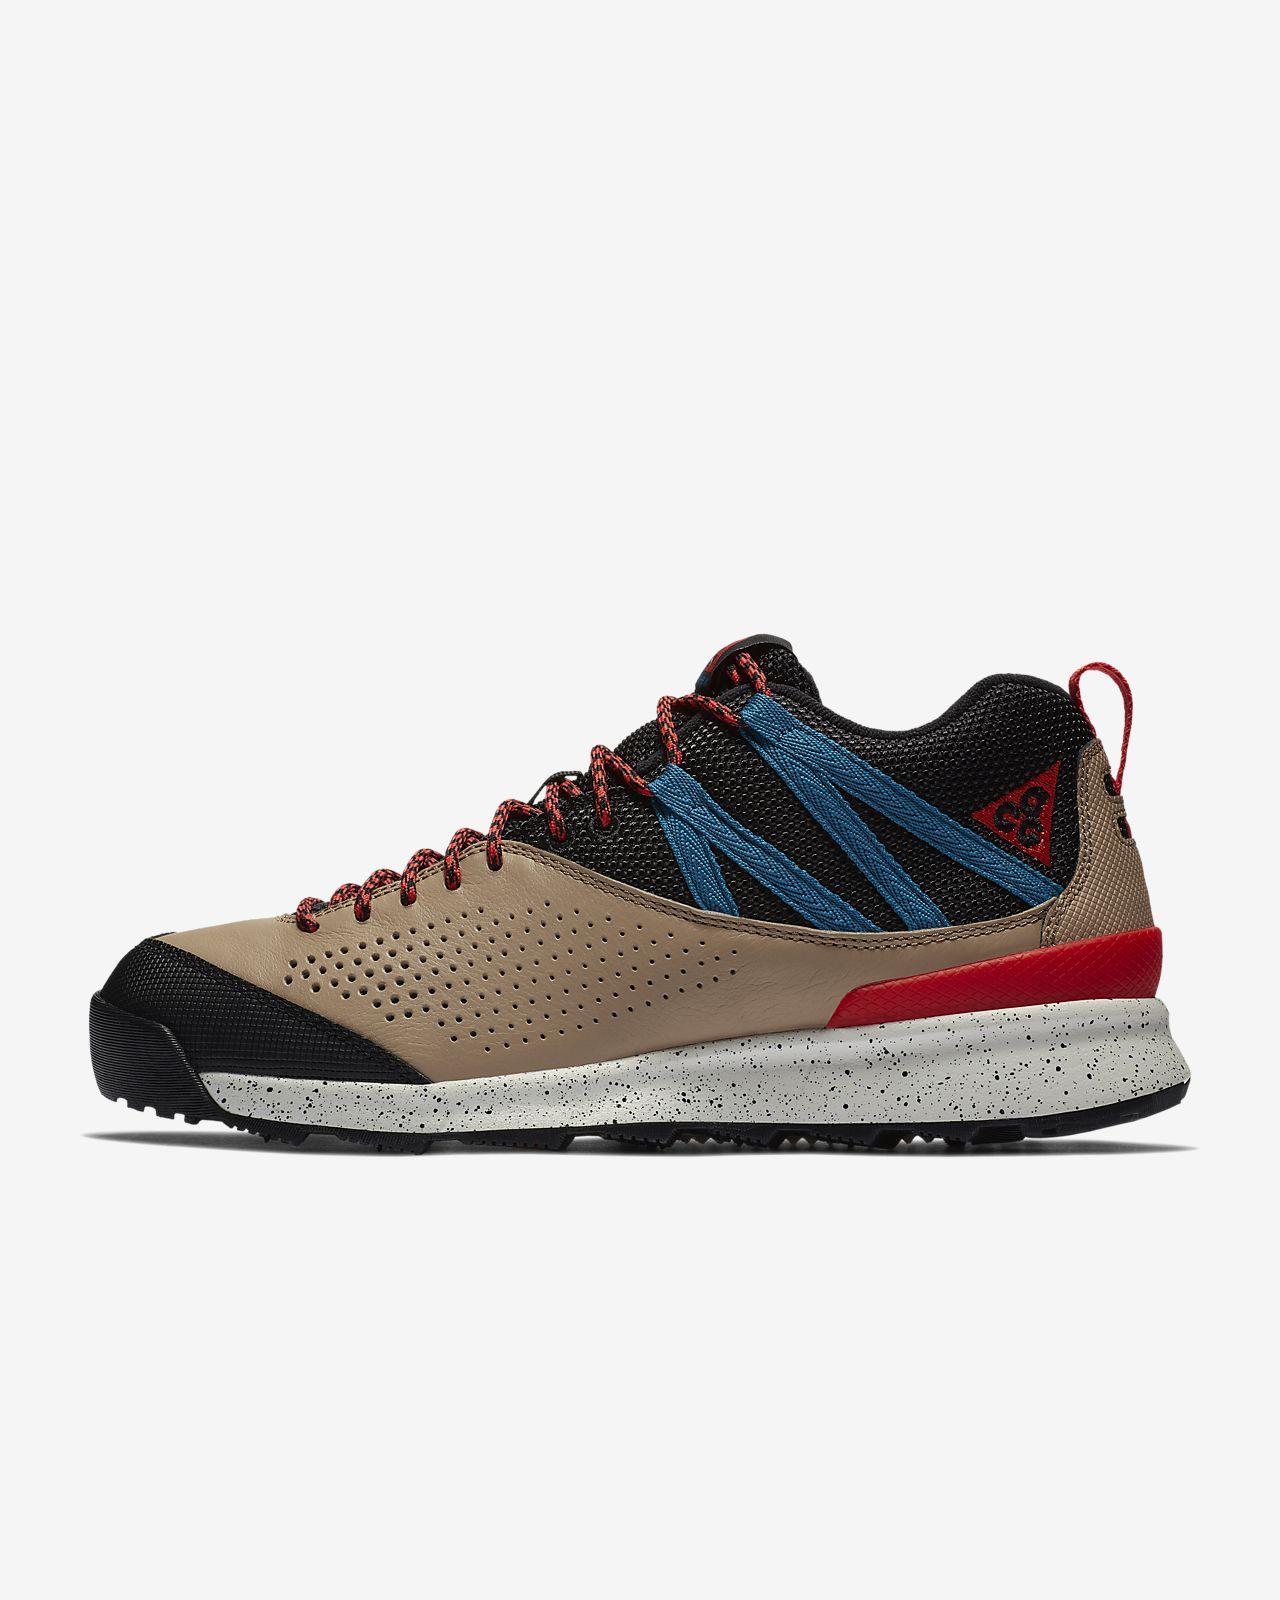 pretty nice 7c39c 515bd ... Sko Nike Okwahn II för män